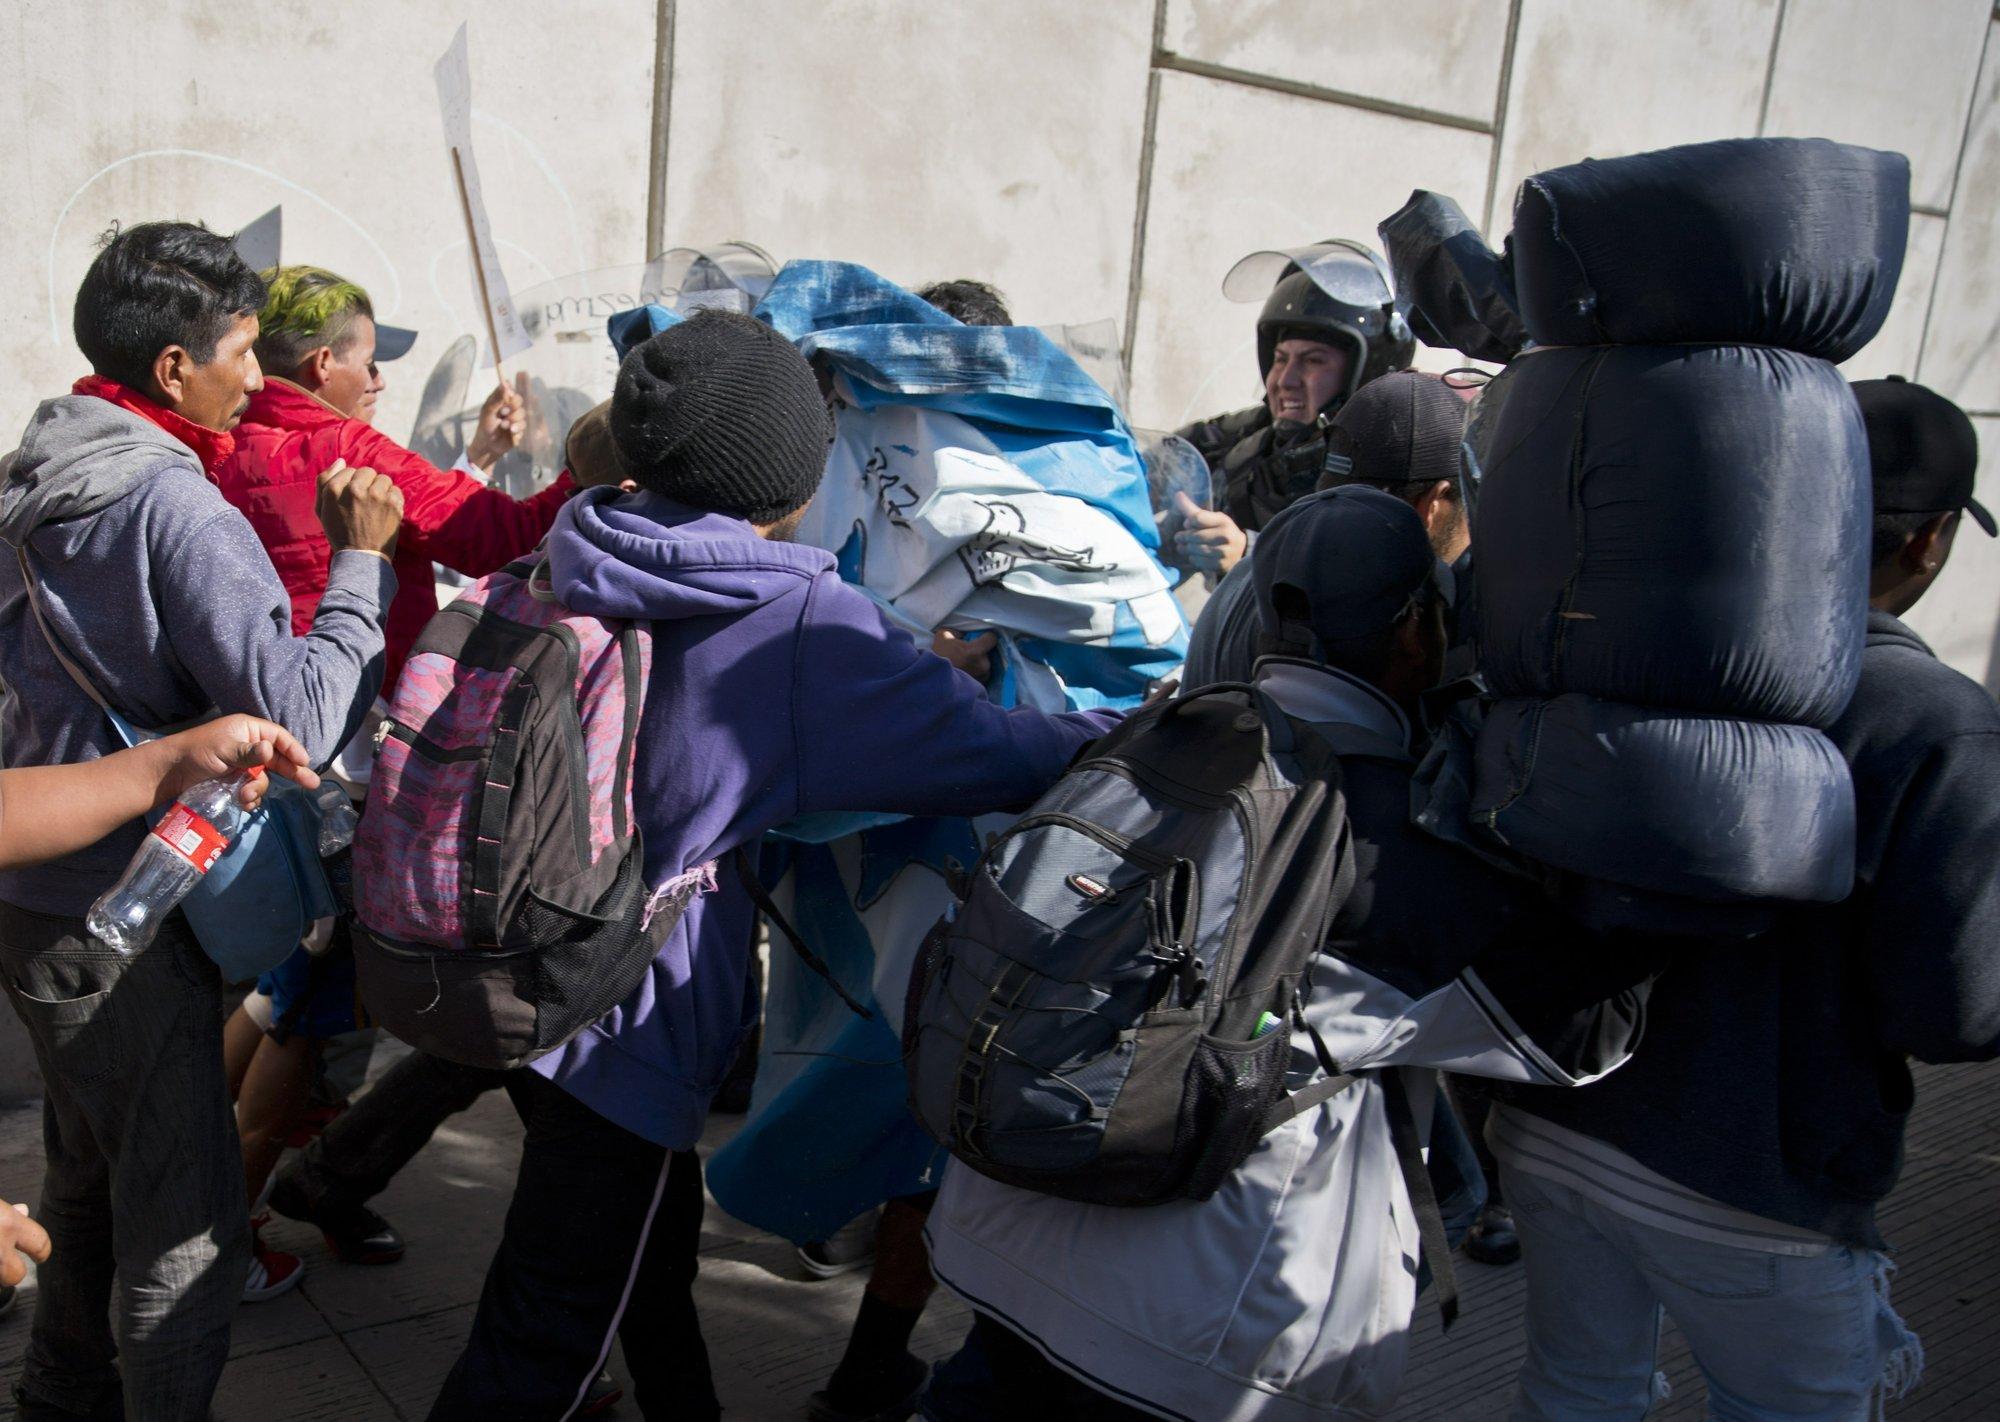 US agents shoot tear gas at migrants